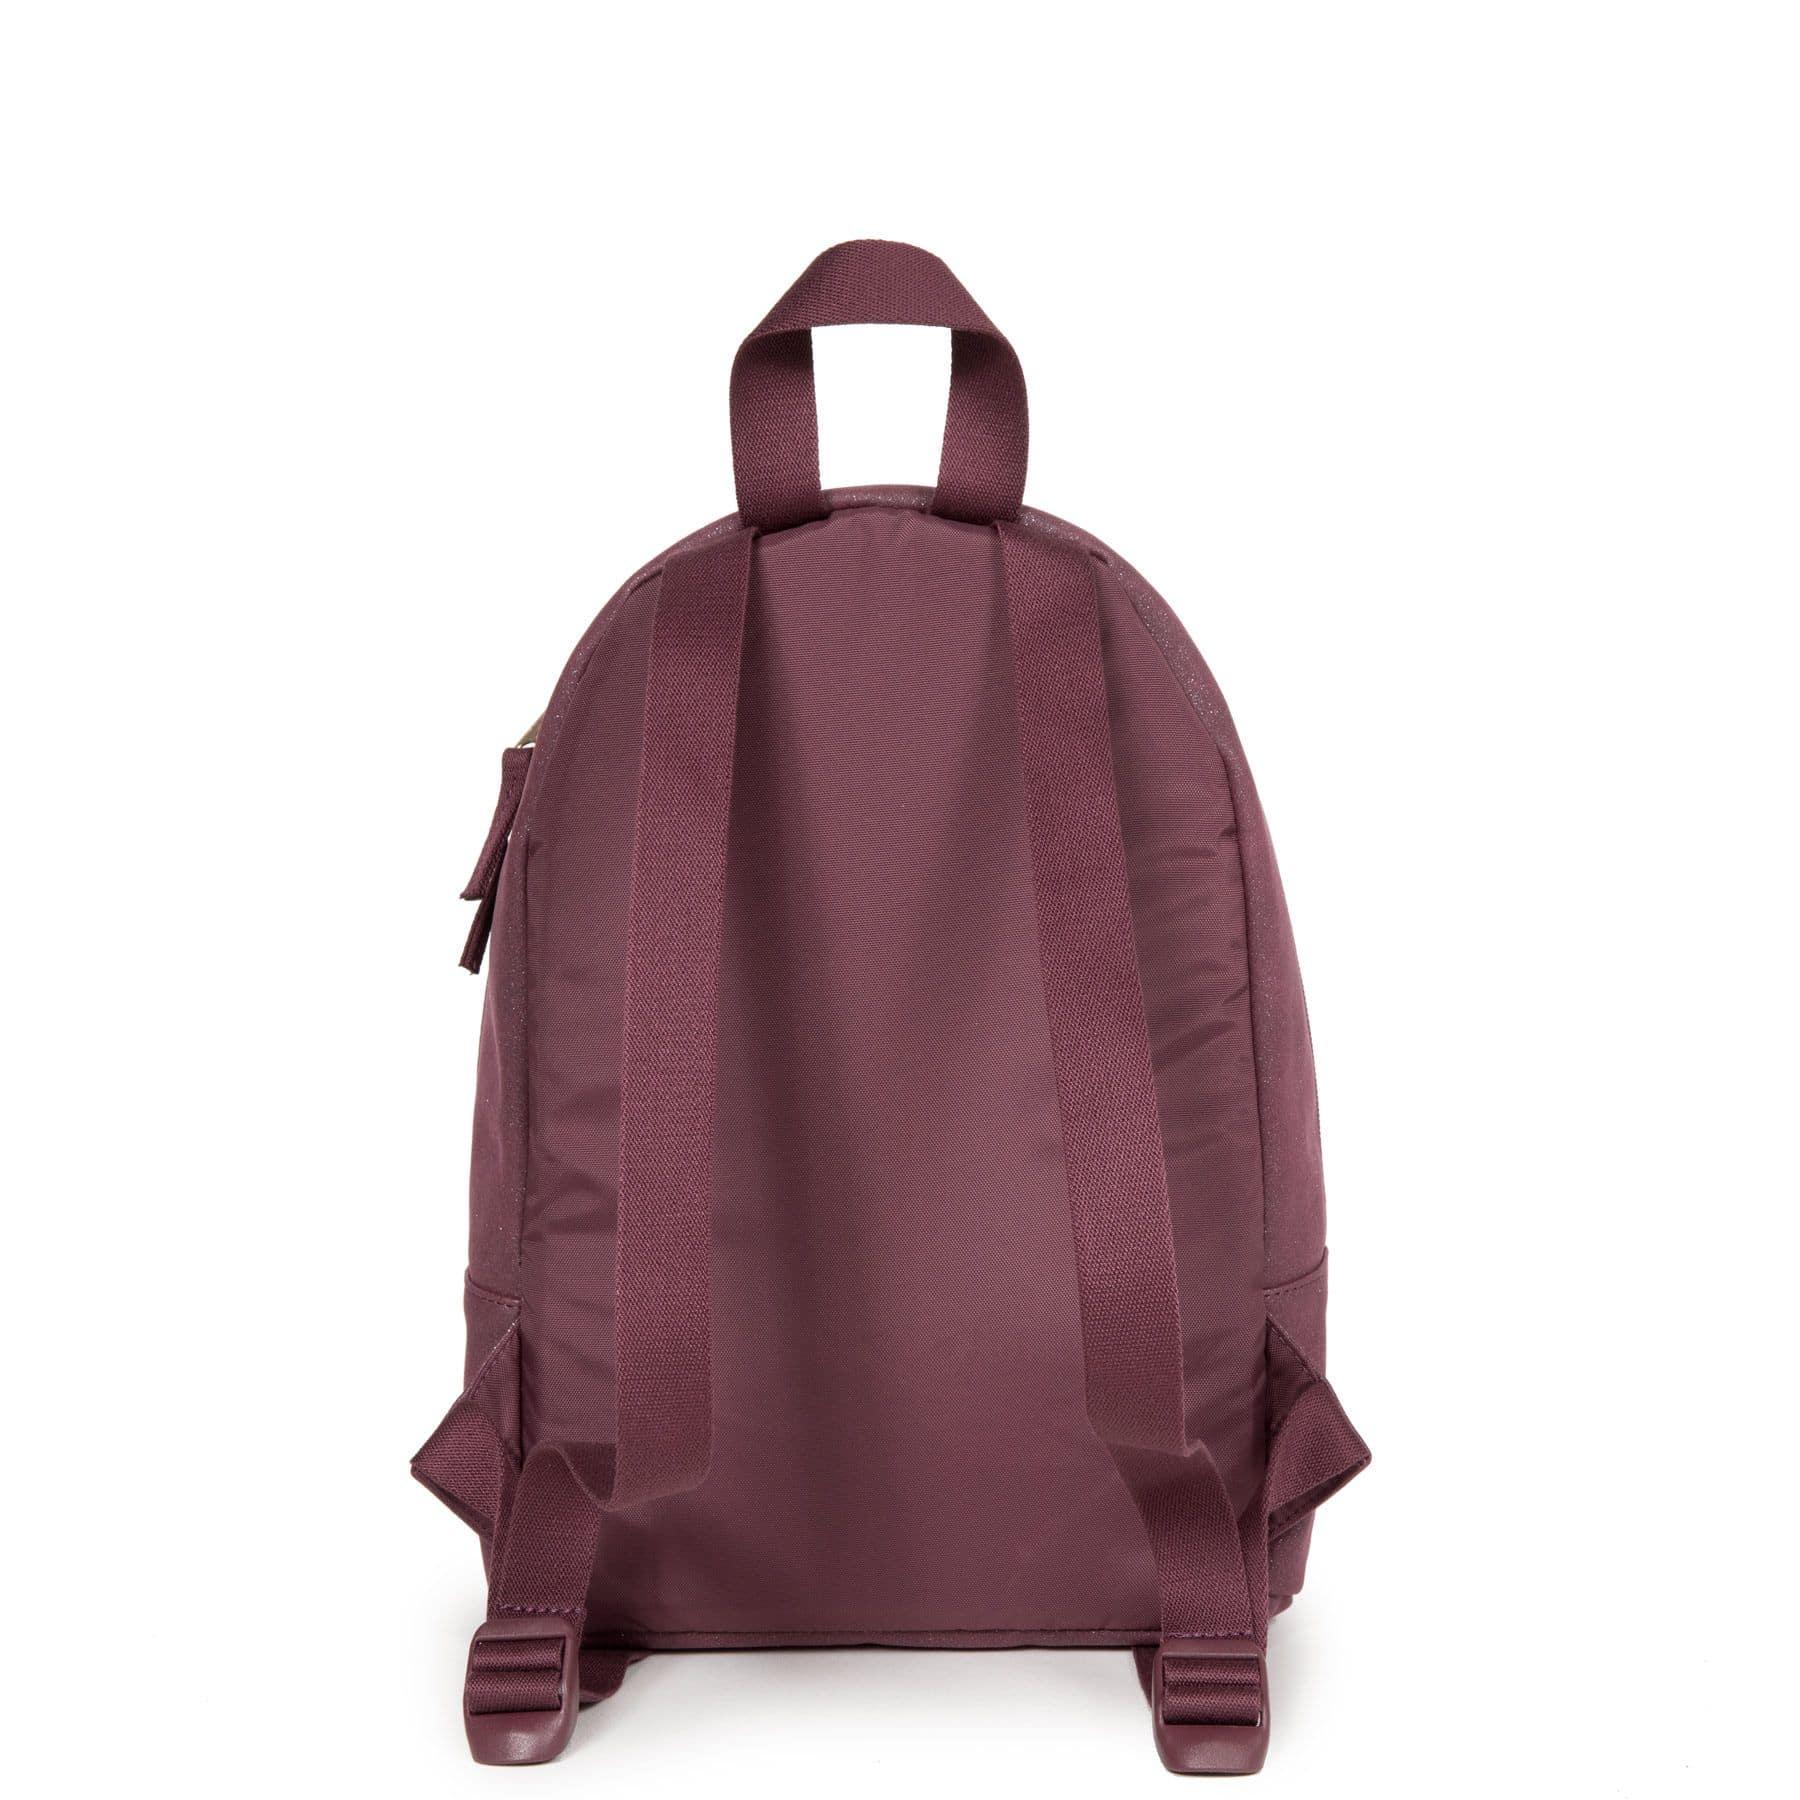 Eastpak Lucia Super Fashion Backpack Purple-185012